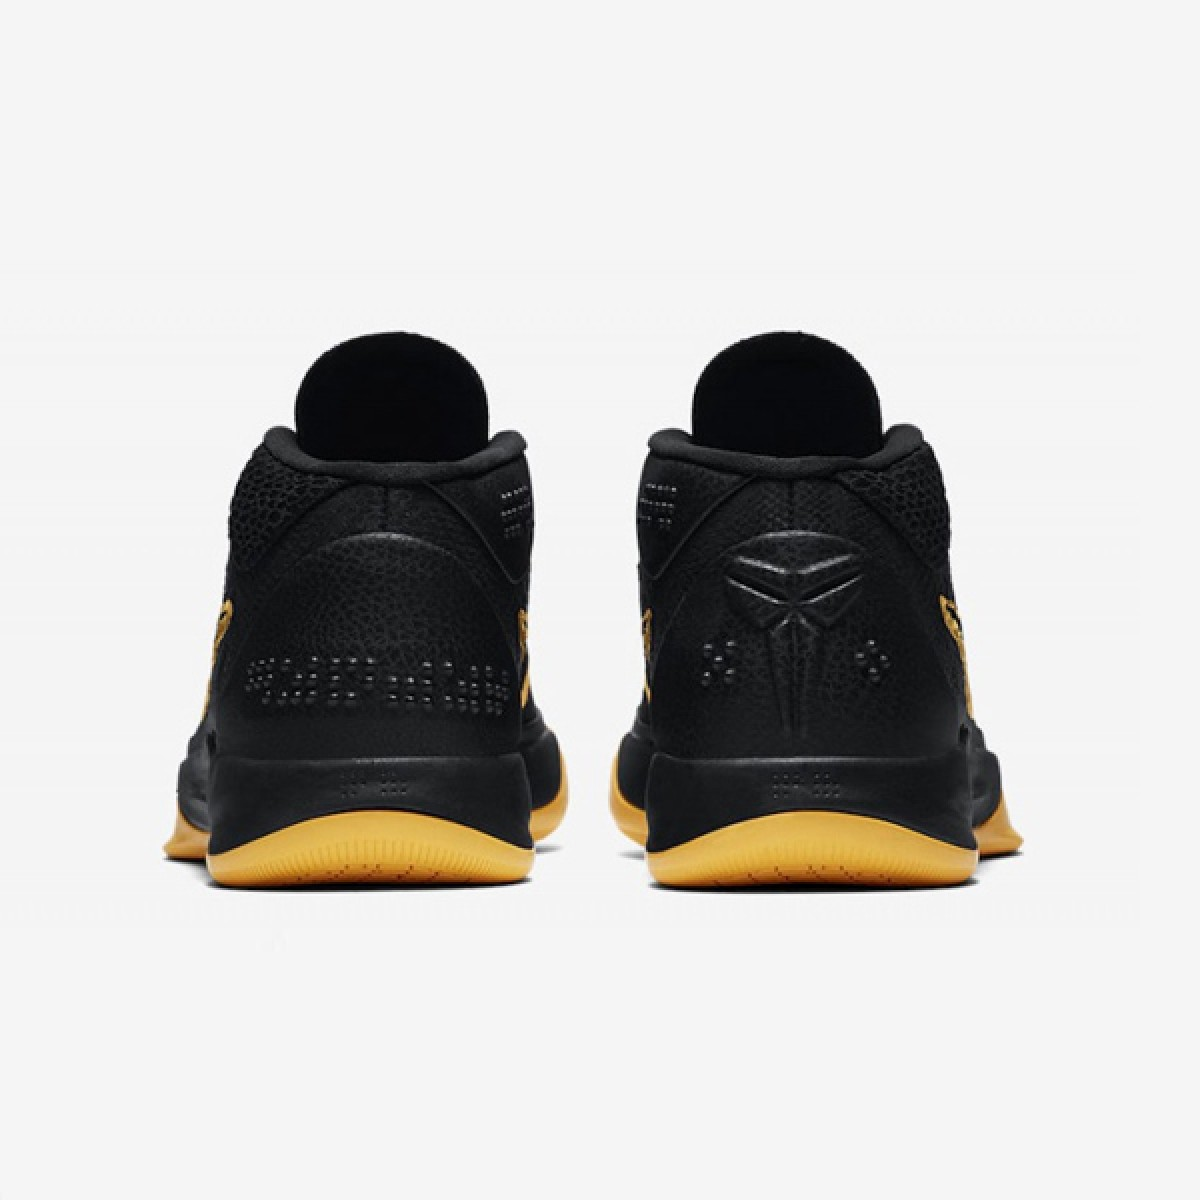 san francisco b05e6 cb08d Nike Kobe AD Mid  Black Mamba  AQ5164-001